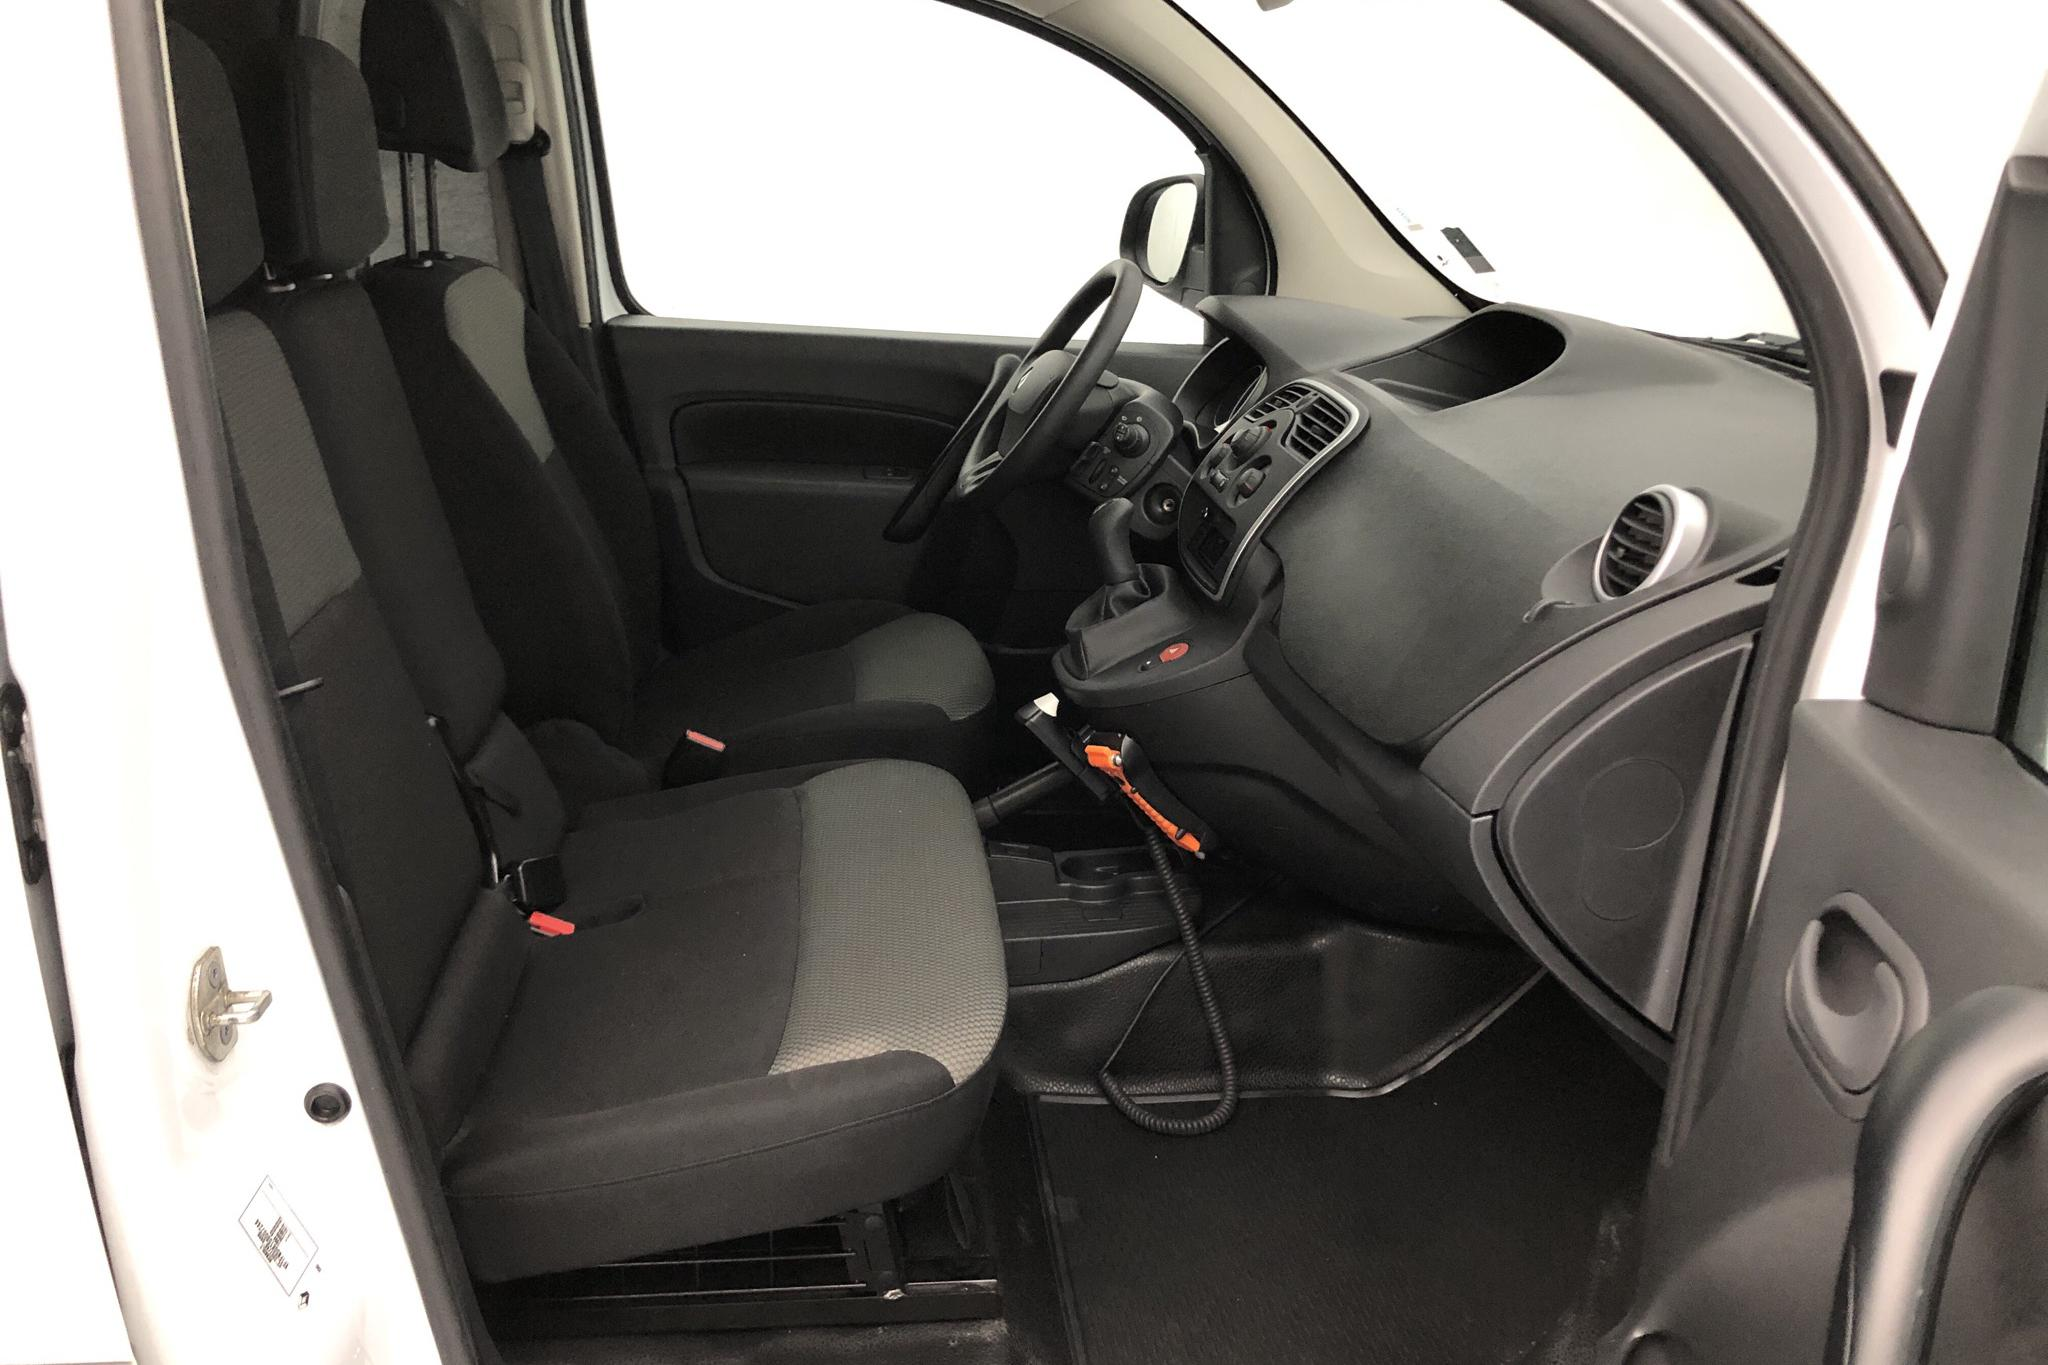 Renault Kangoo 1.5 dCi Skåp (75hk) - 20 340 km - Manual - white - 2018